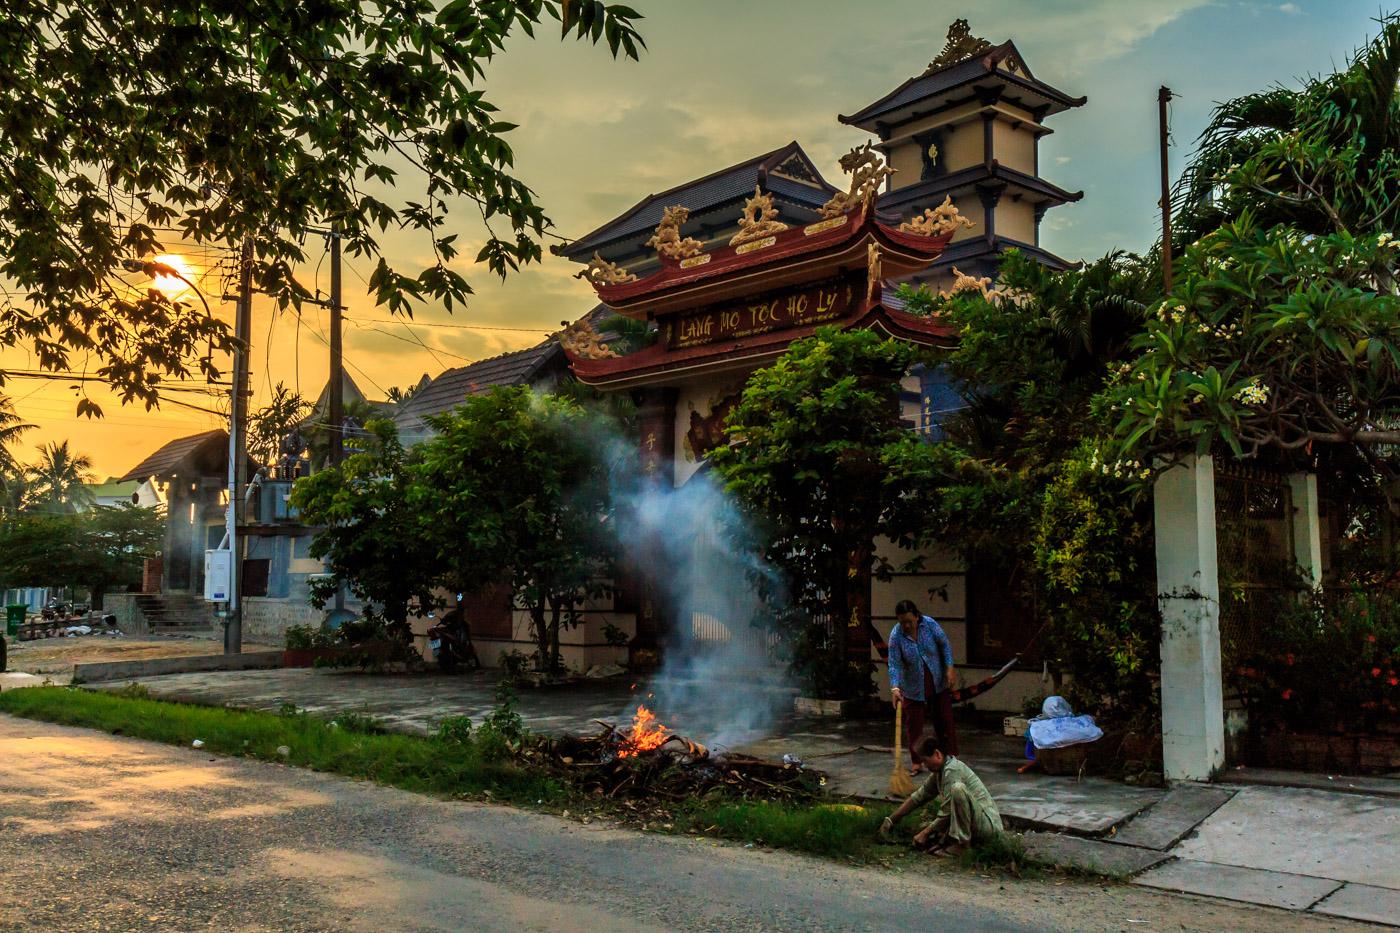 Burning trash outside a temple.